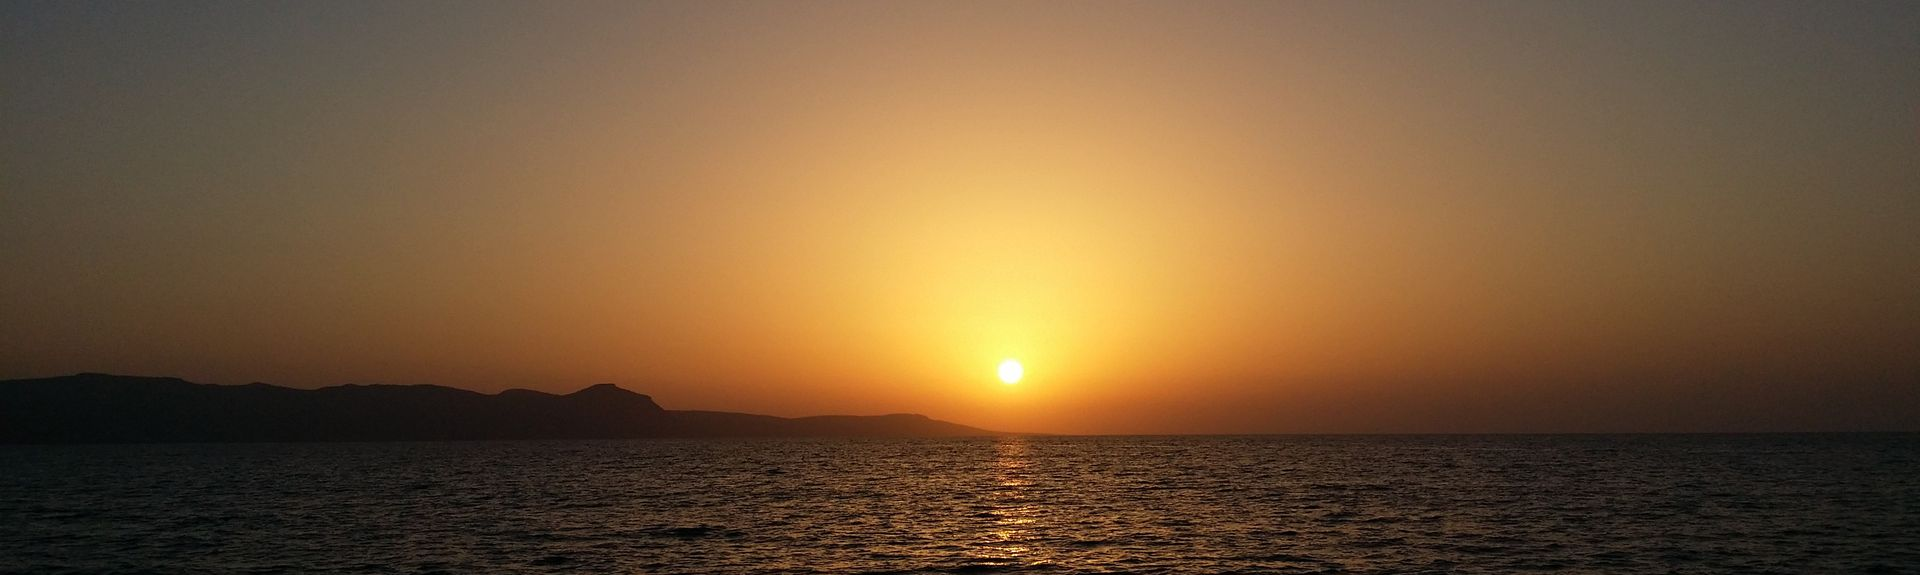 Pachyammos, District de Nicosie, Chypre